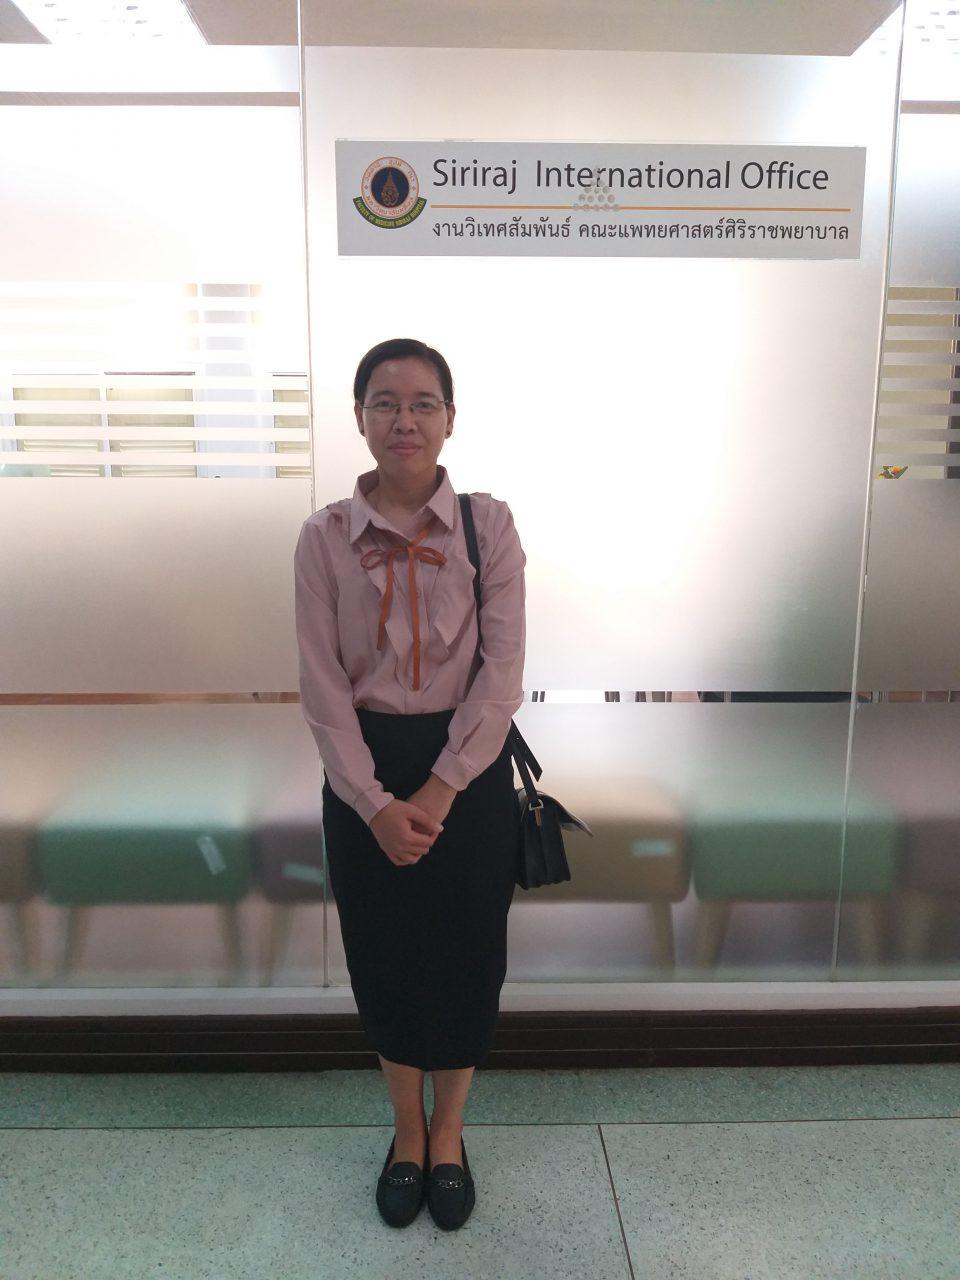 Siriraj Scholarship for ASEAN Doctors and Developing